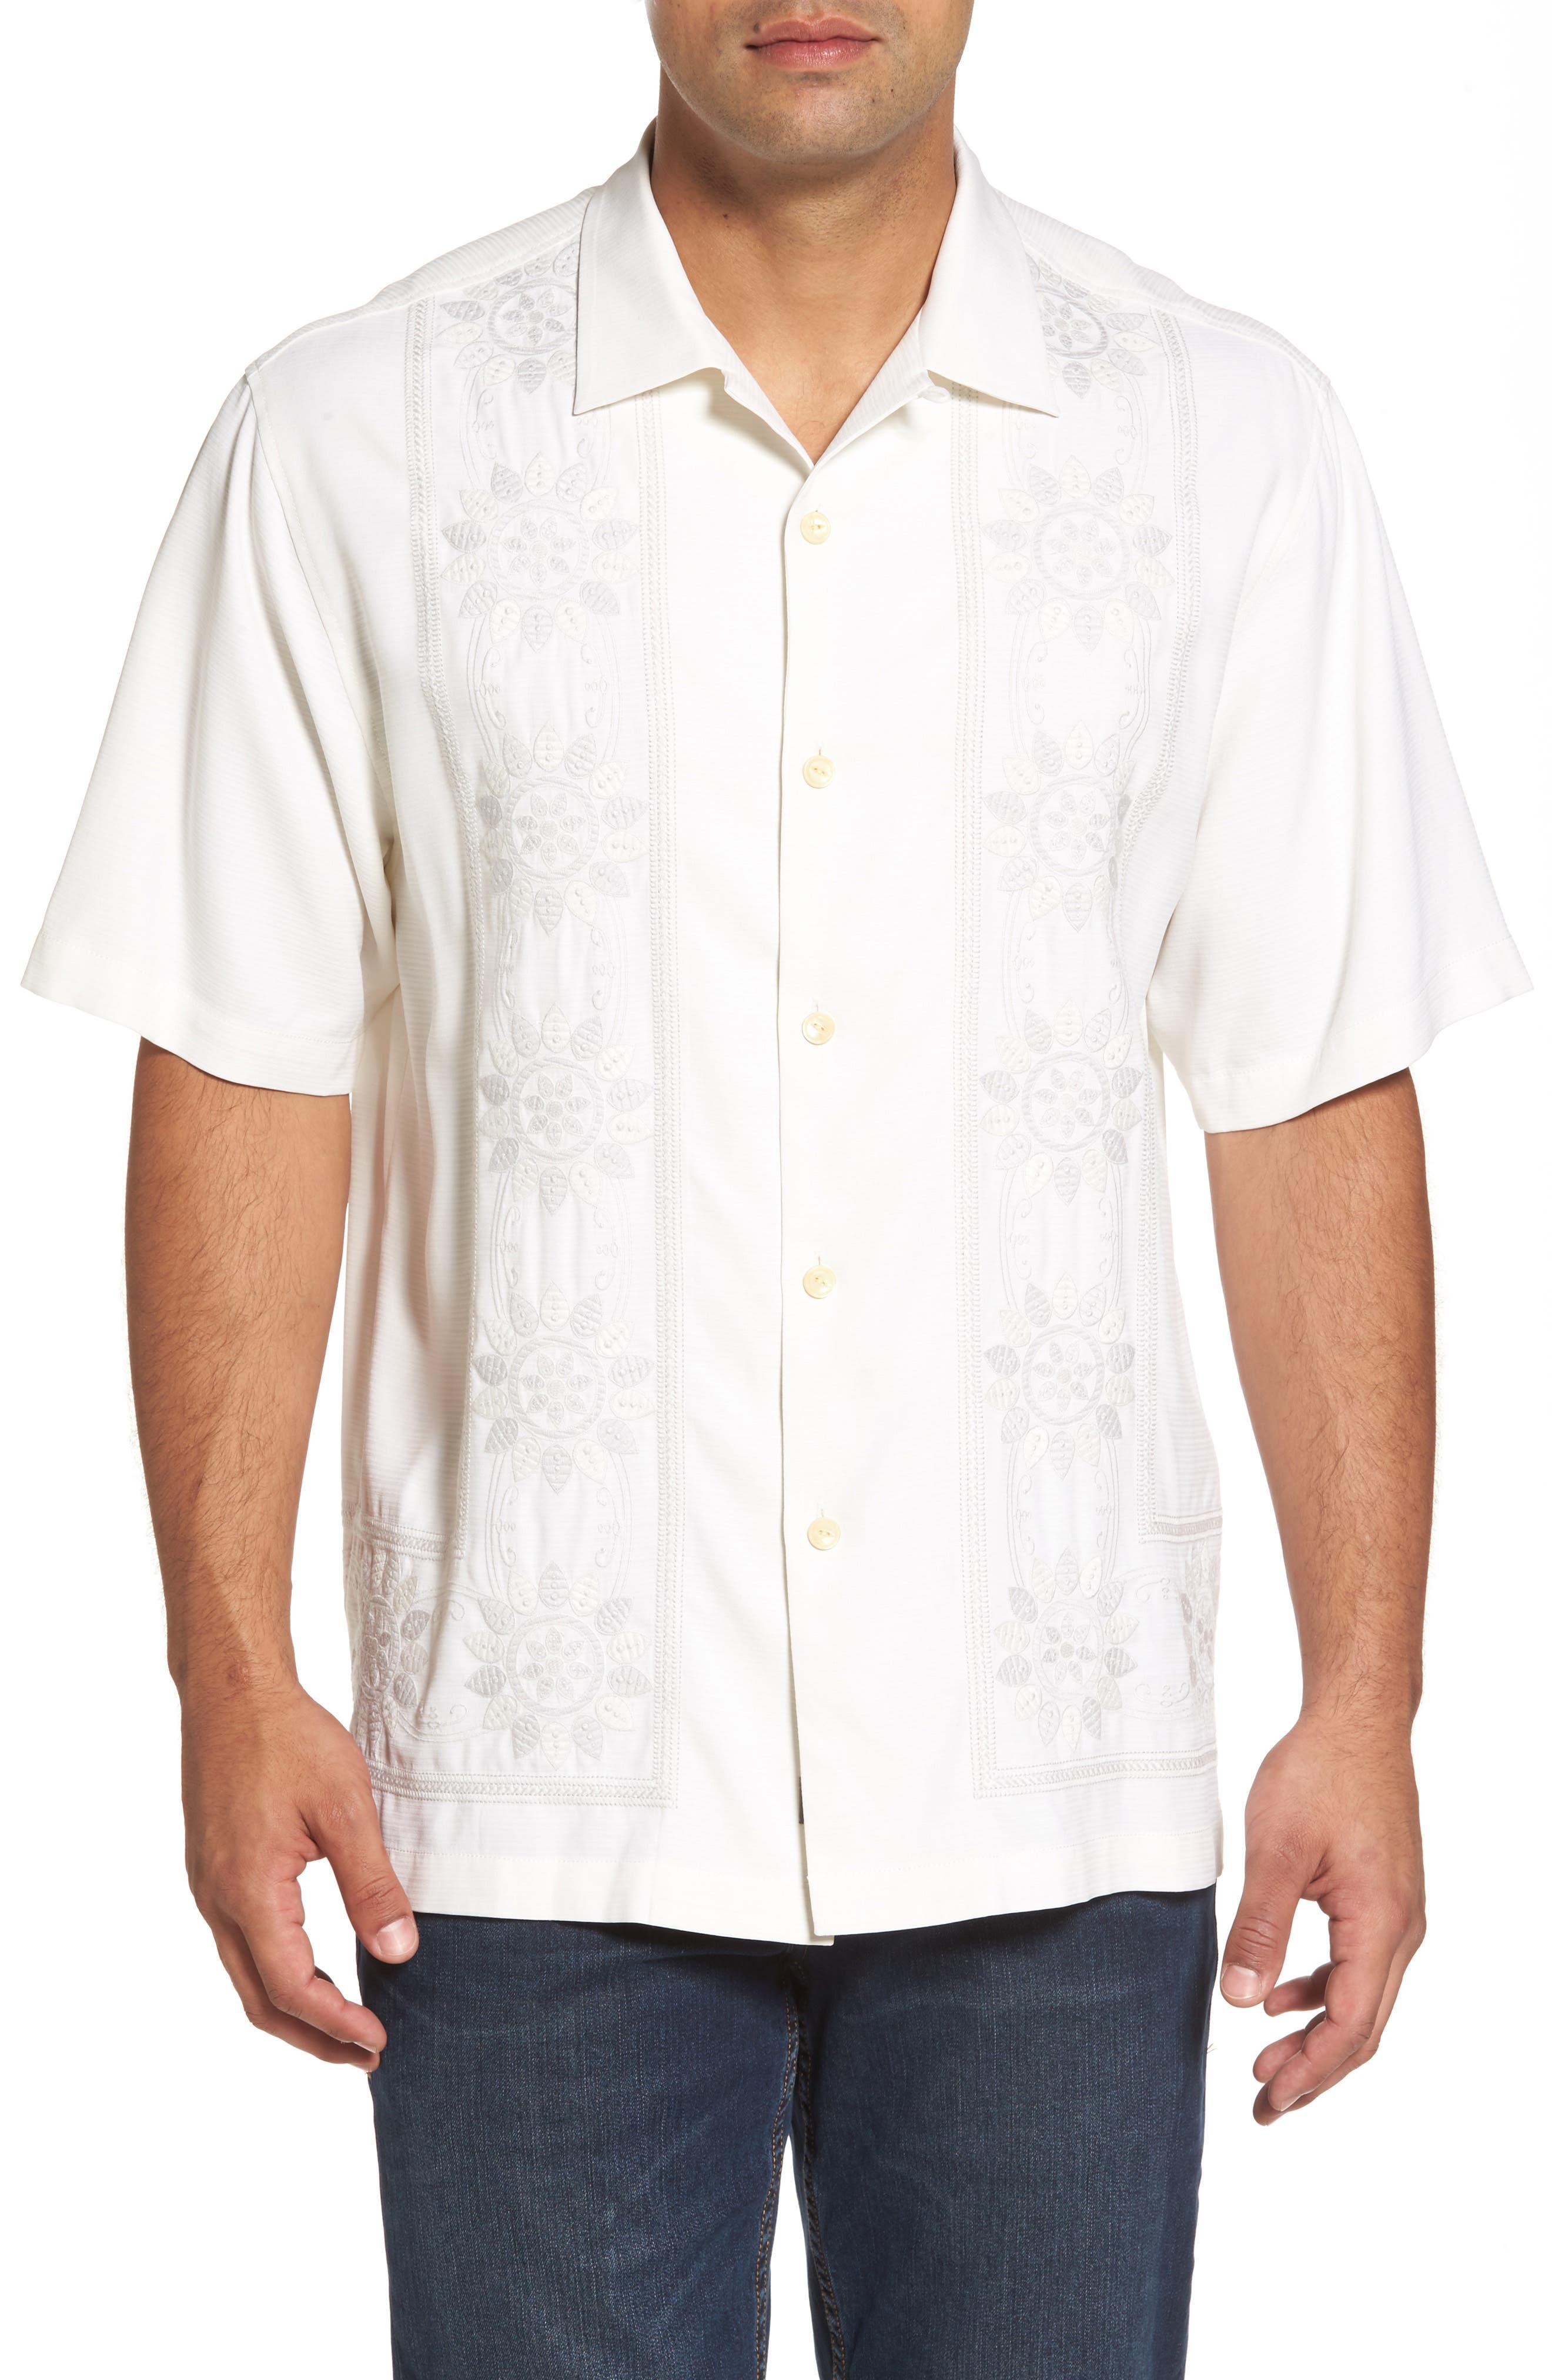 Tangier Tiles Embroidered Silk Woven Shirt,                             Main thumbnail 1, color,